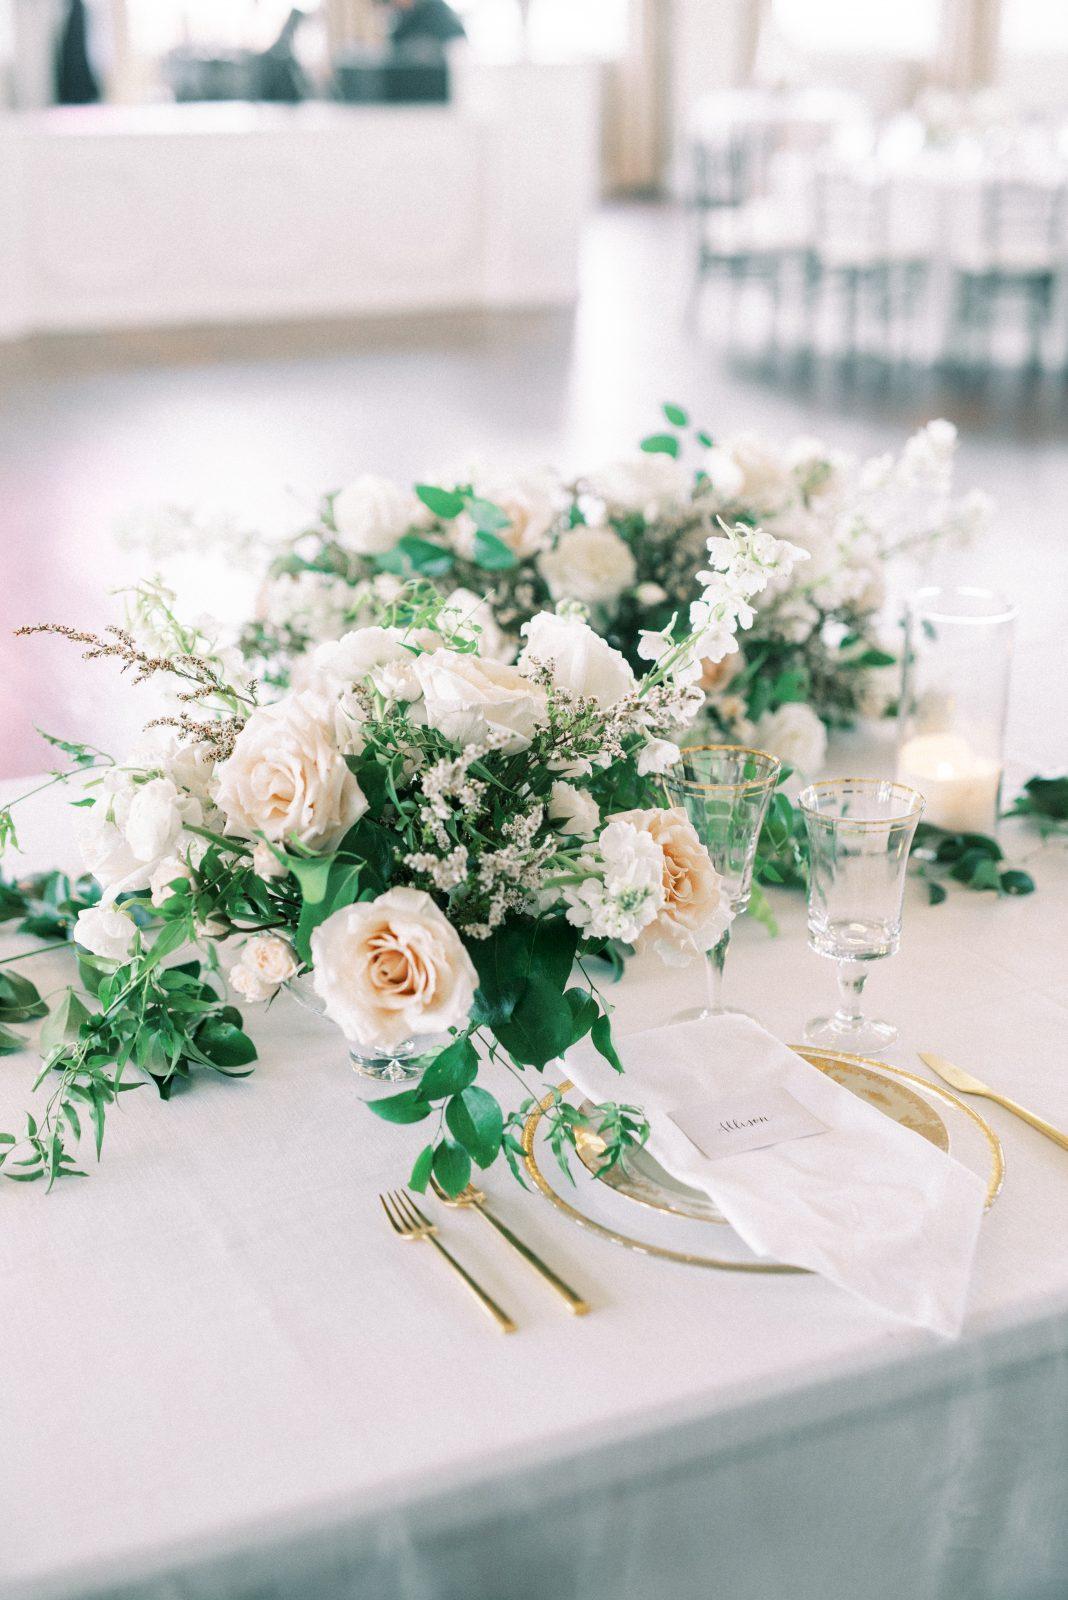 Alba Dahlia Floral wedding centerpieces for Room on Main wedding